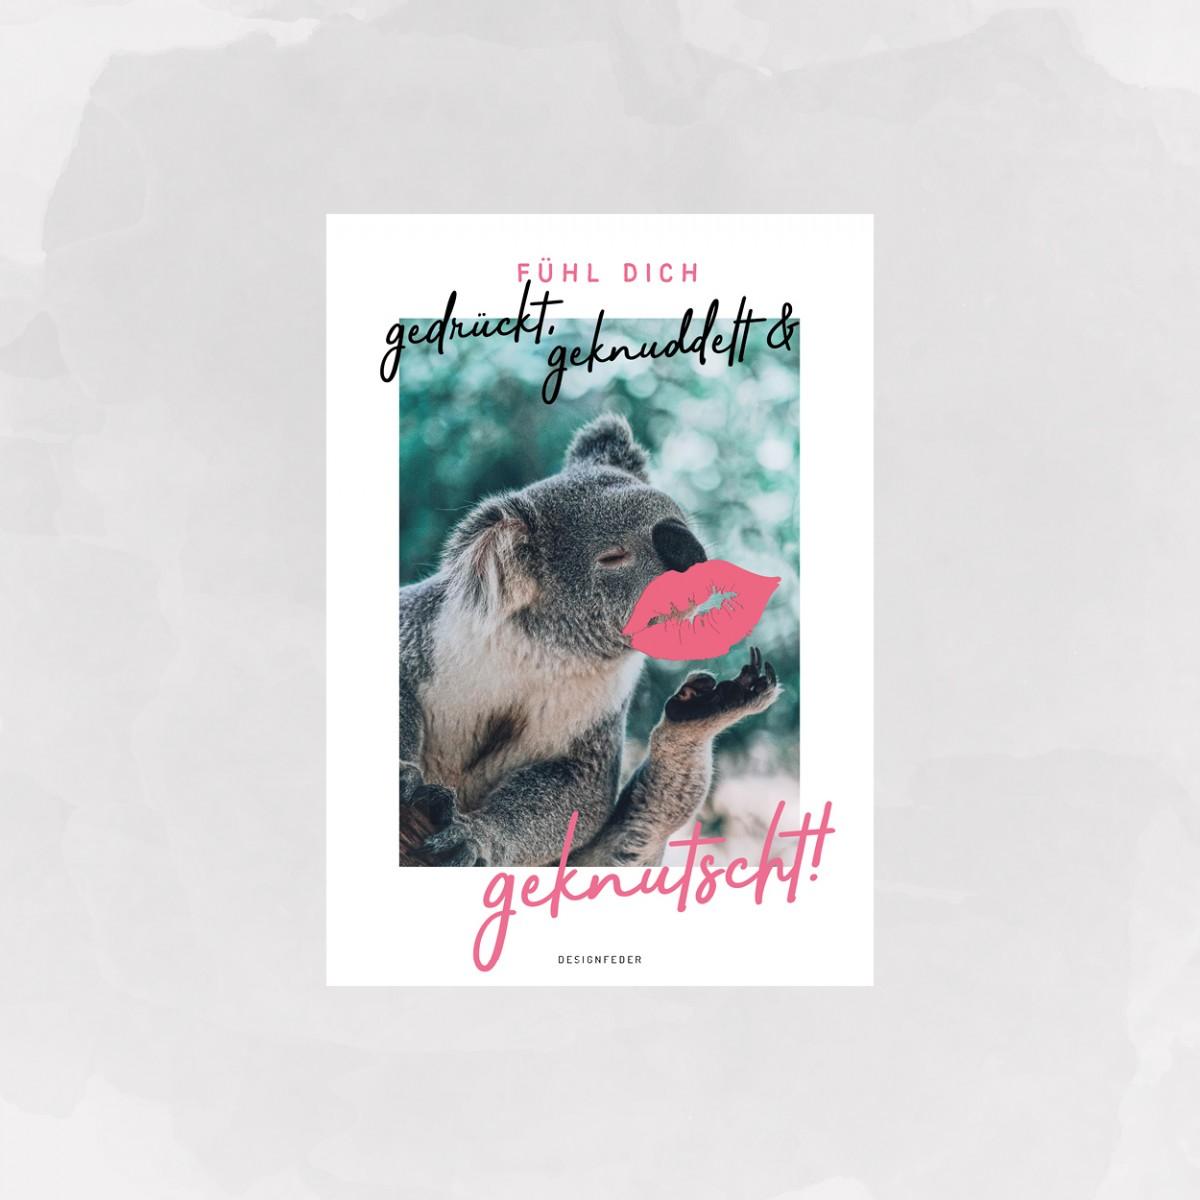 designfeder   Postkarte Fühl dich gedrückt, geknuddelt und geknutscht (Koala)